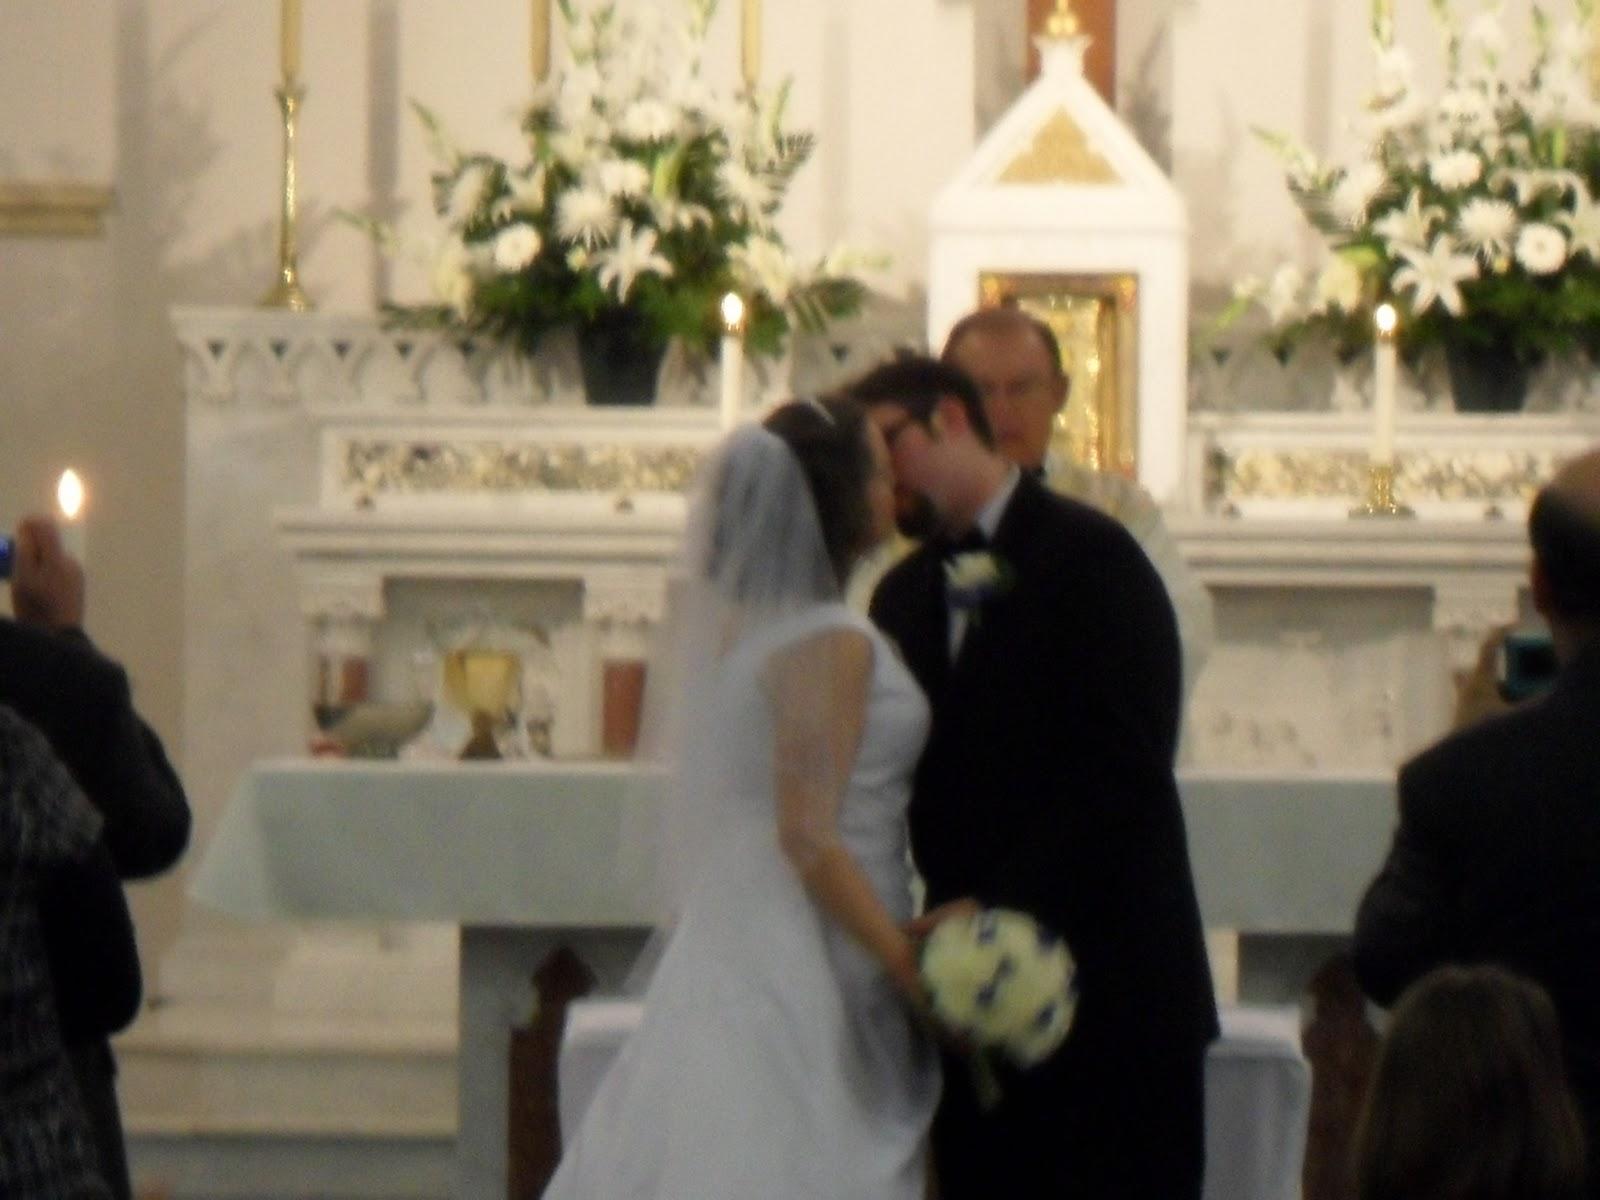 Our Wedding, photos by Rachel Perez - SAM_0161.JPG